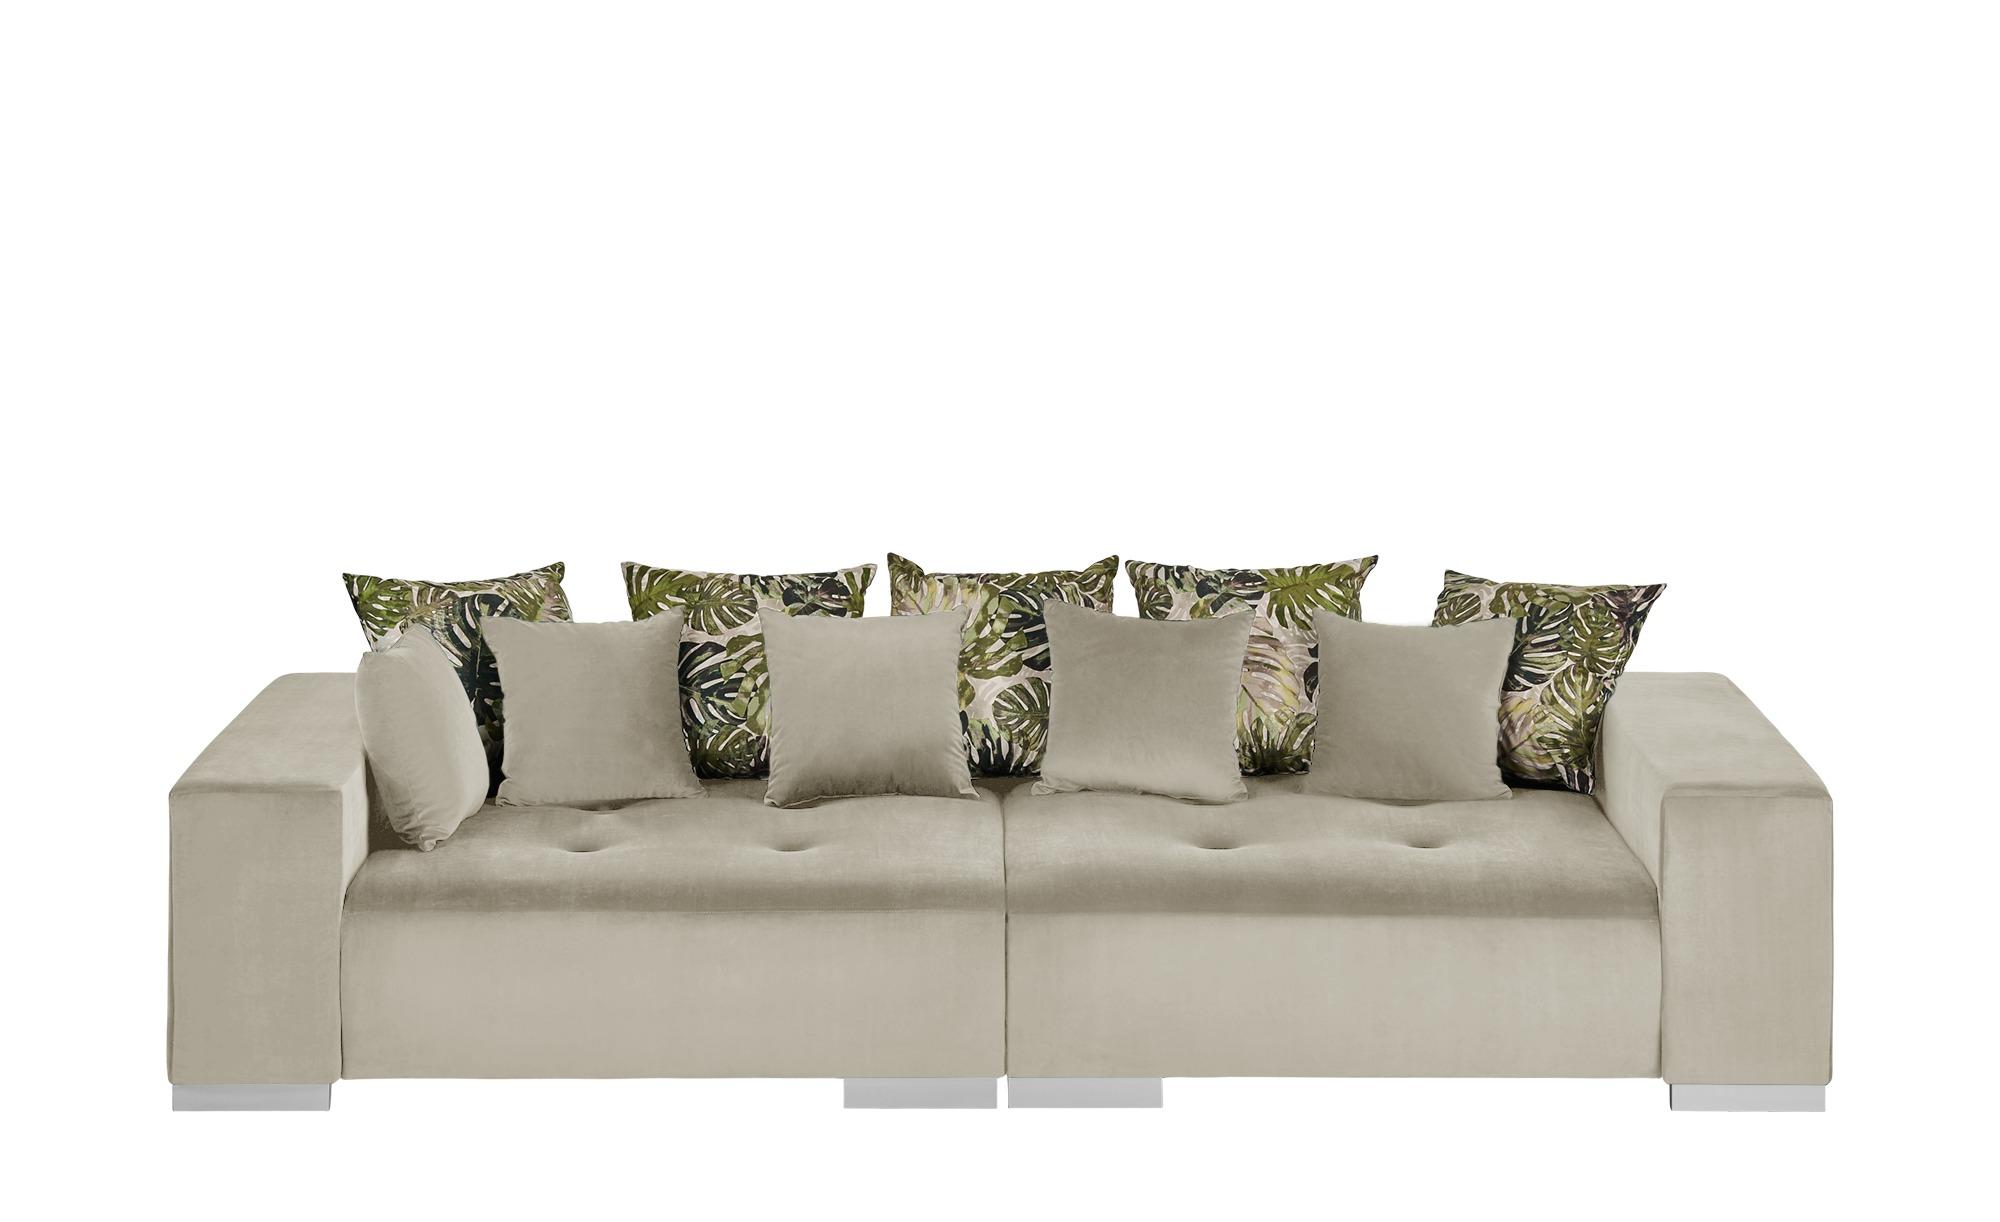 switch Big Sofa  Max ¦ beige ¦ Maße (cm): B: 300 H: 85 T: 136 Polstermöbel > Sofas > Big-Sofas - Höffner